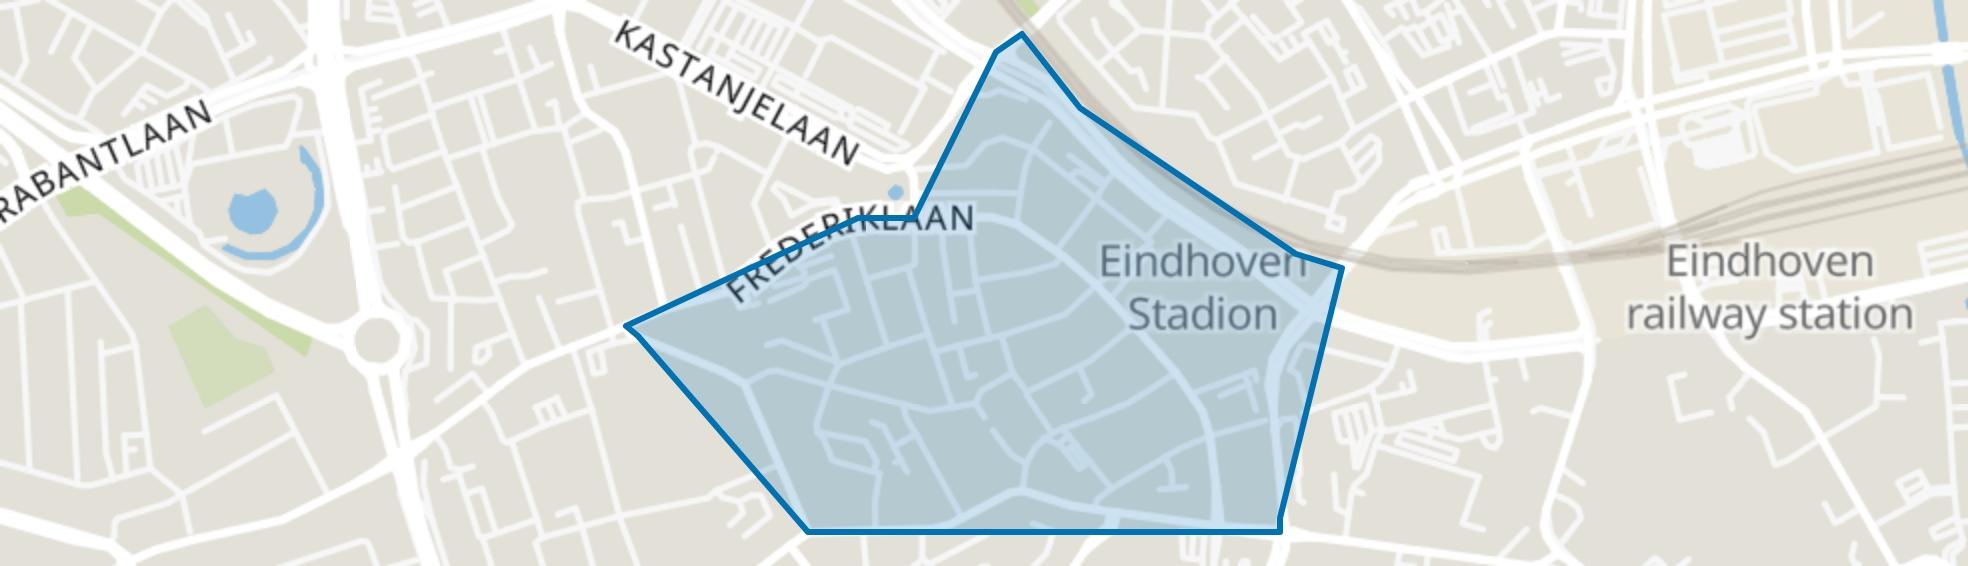 Philipsdorp, Eindhoven map